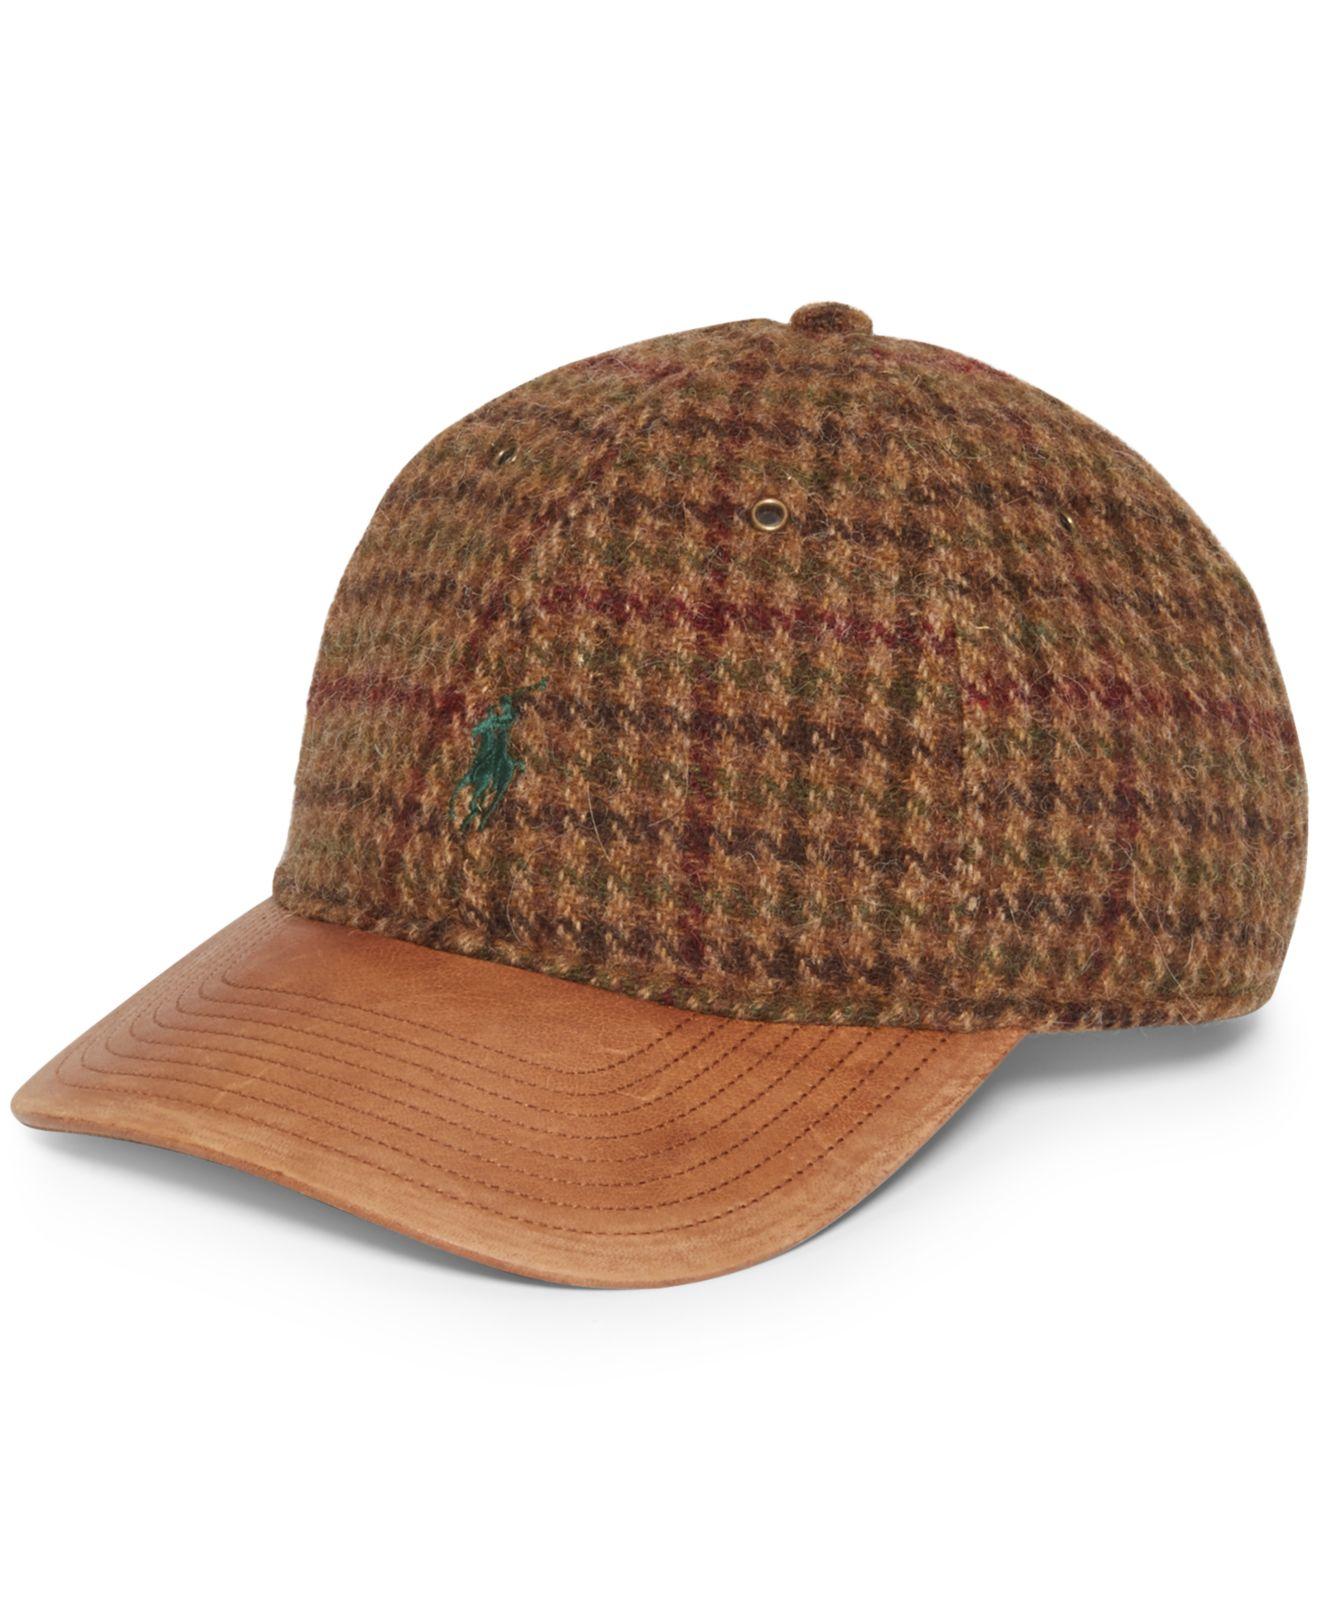 polo ralph lauren tweed baseball cap in brown for men lyst. Black Bedroom Furniture Sets. Home Design Ideas